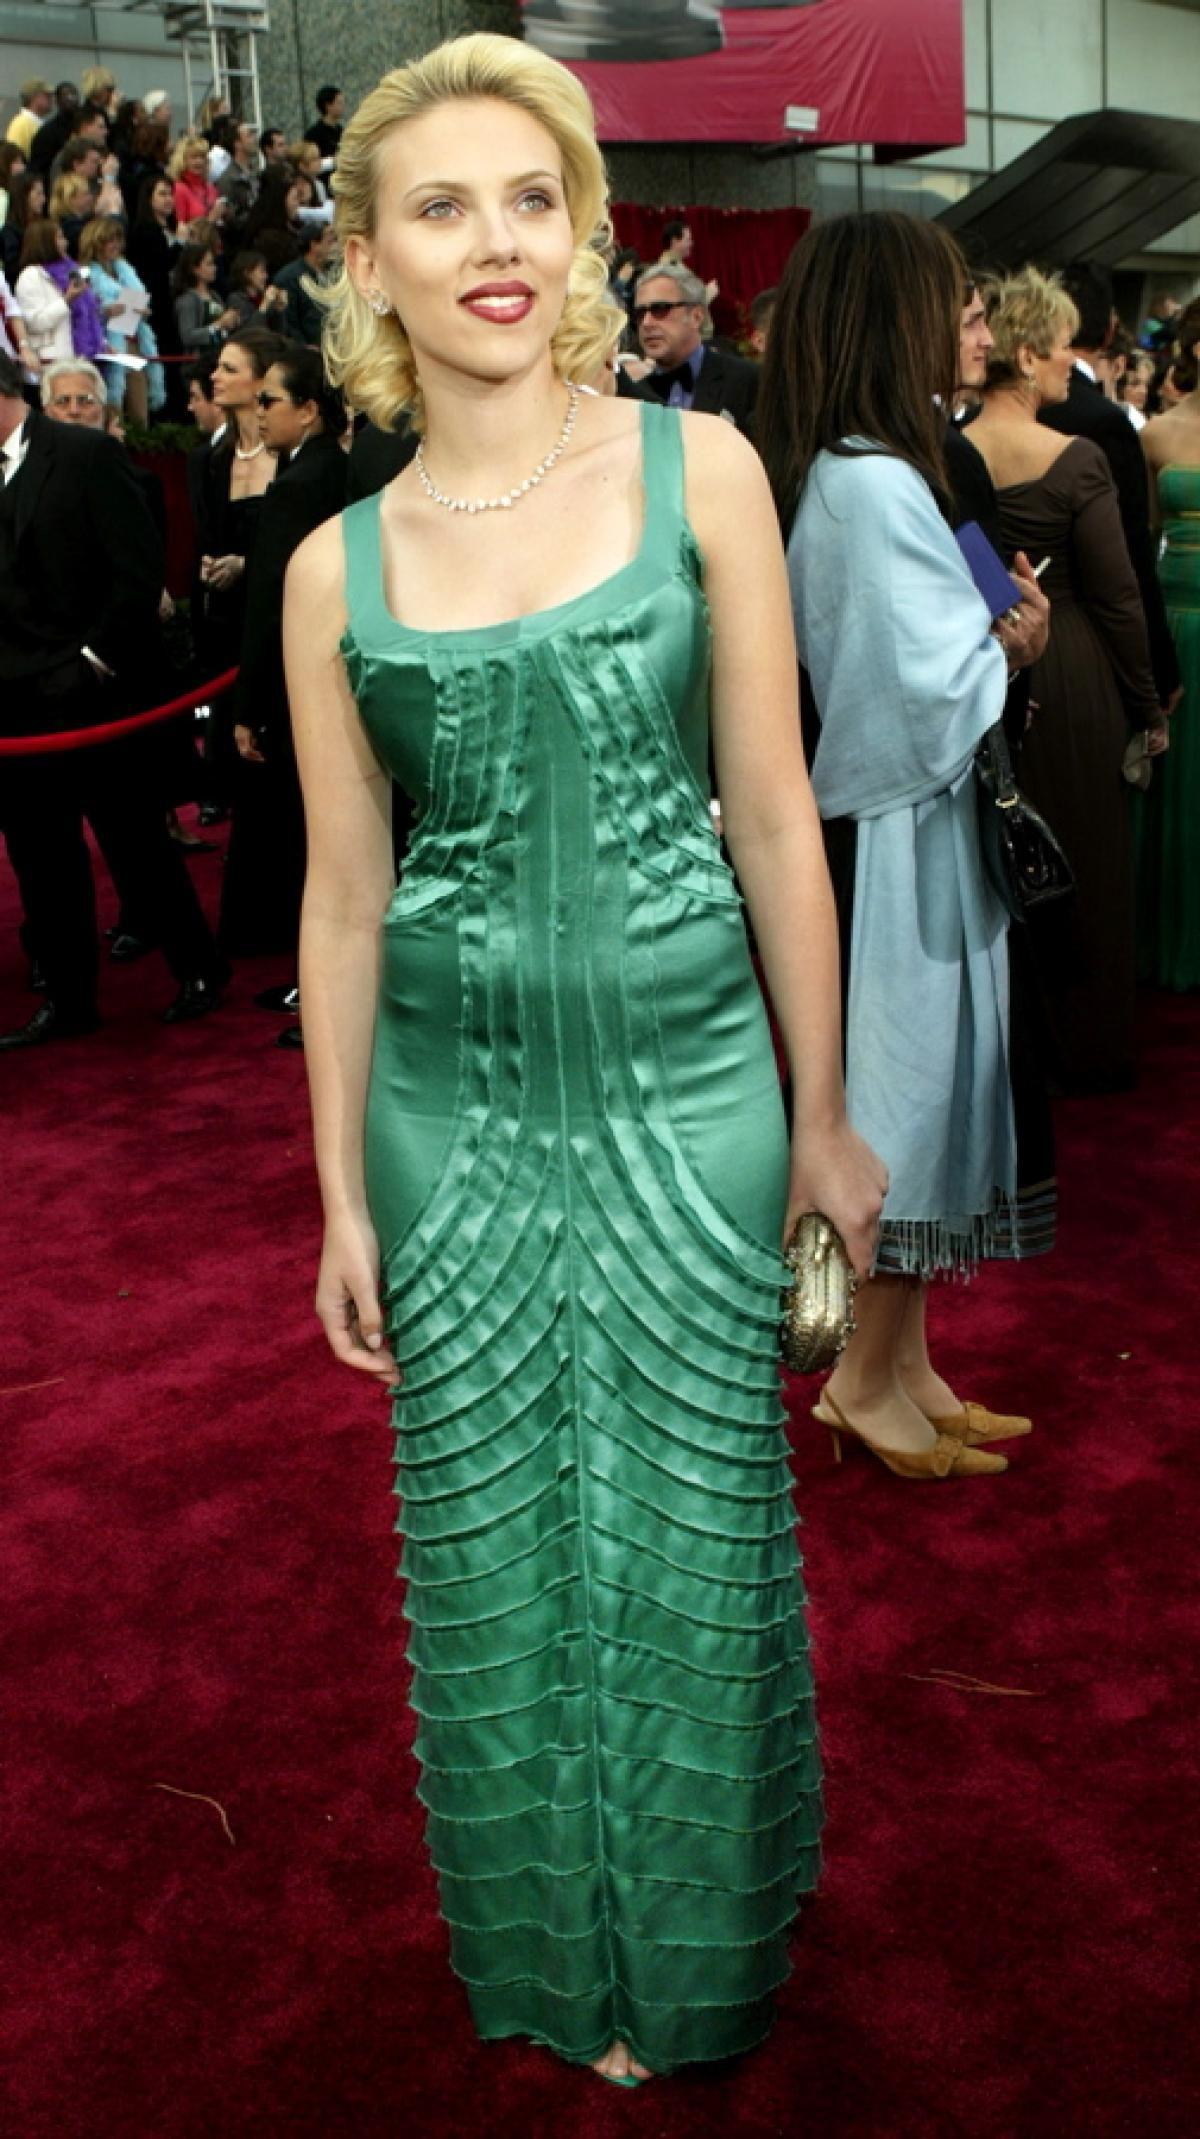 Best Oscar dresses of all time | Green satin, Scarlett johansson and ...